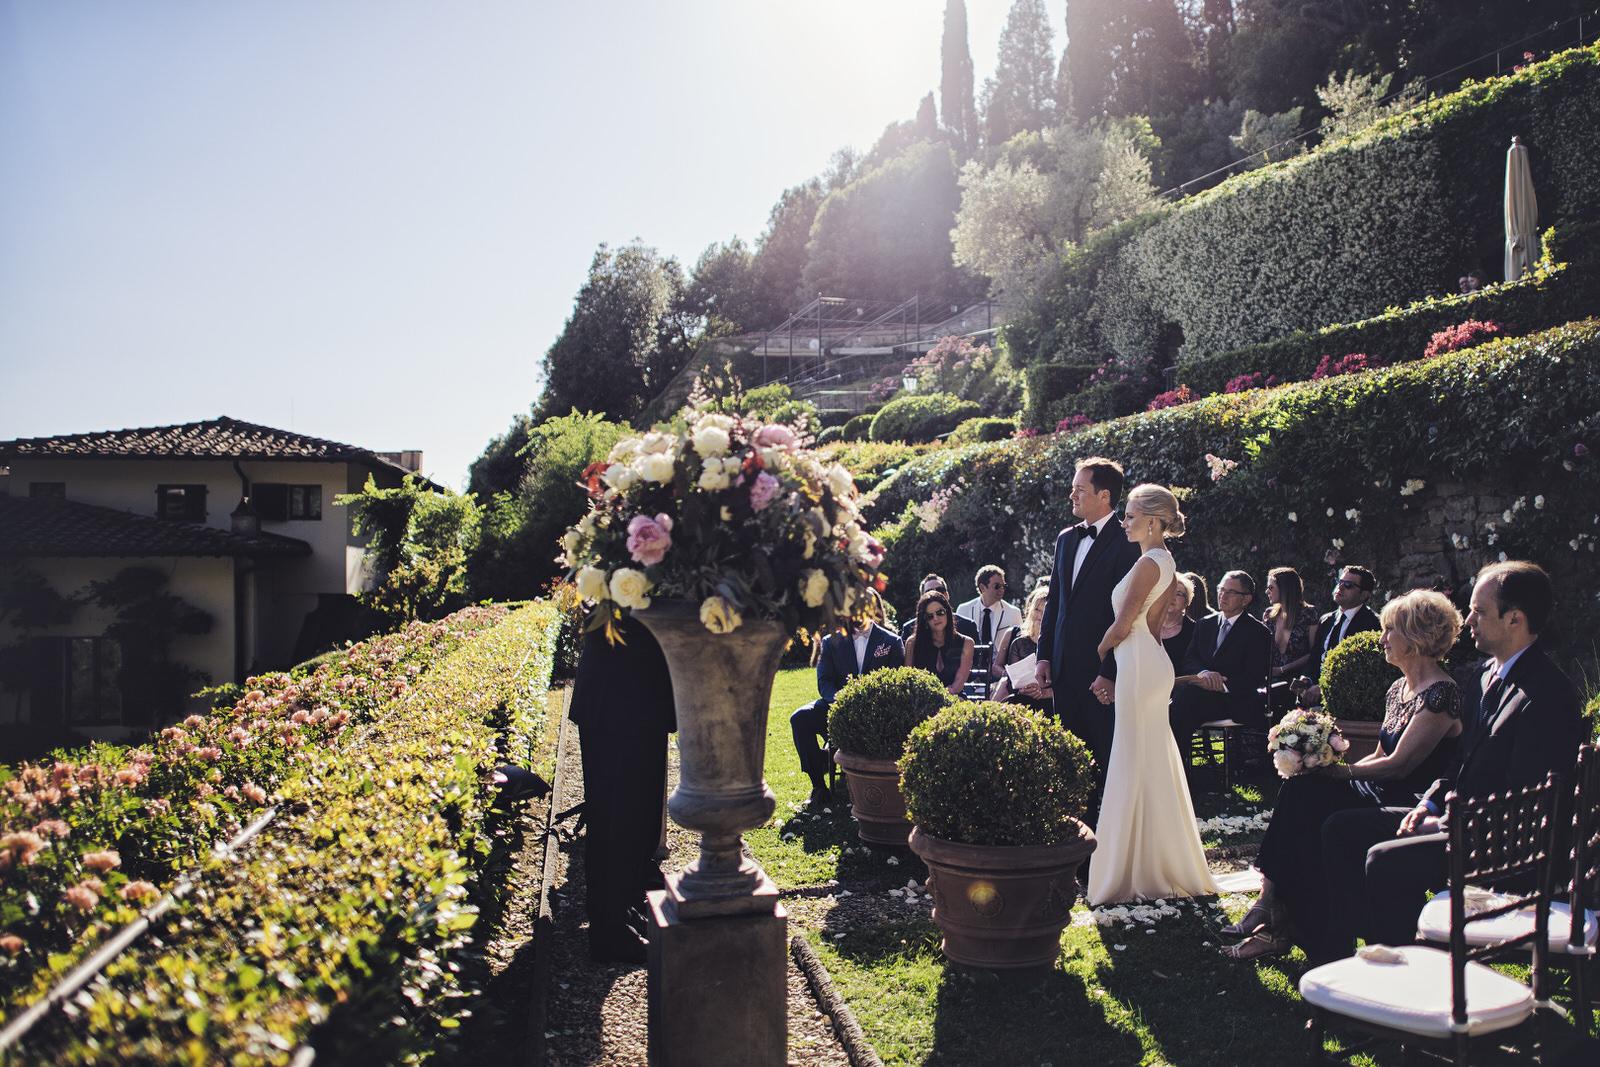 wedding photographer in italy-venice-tuscany-florence-amalfi coast-como lake-villa del balbianello-siena-amalfi-ravello-belmond-villa cimbrone11